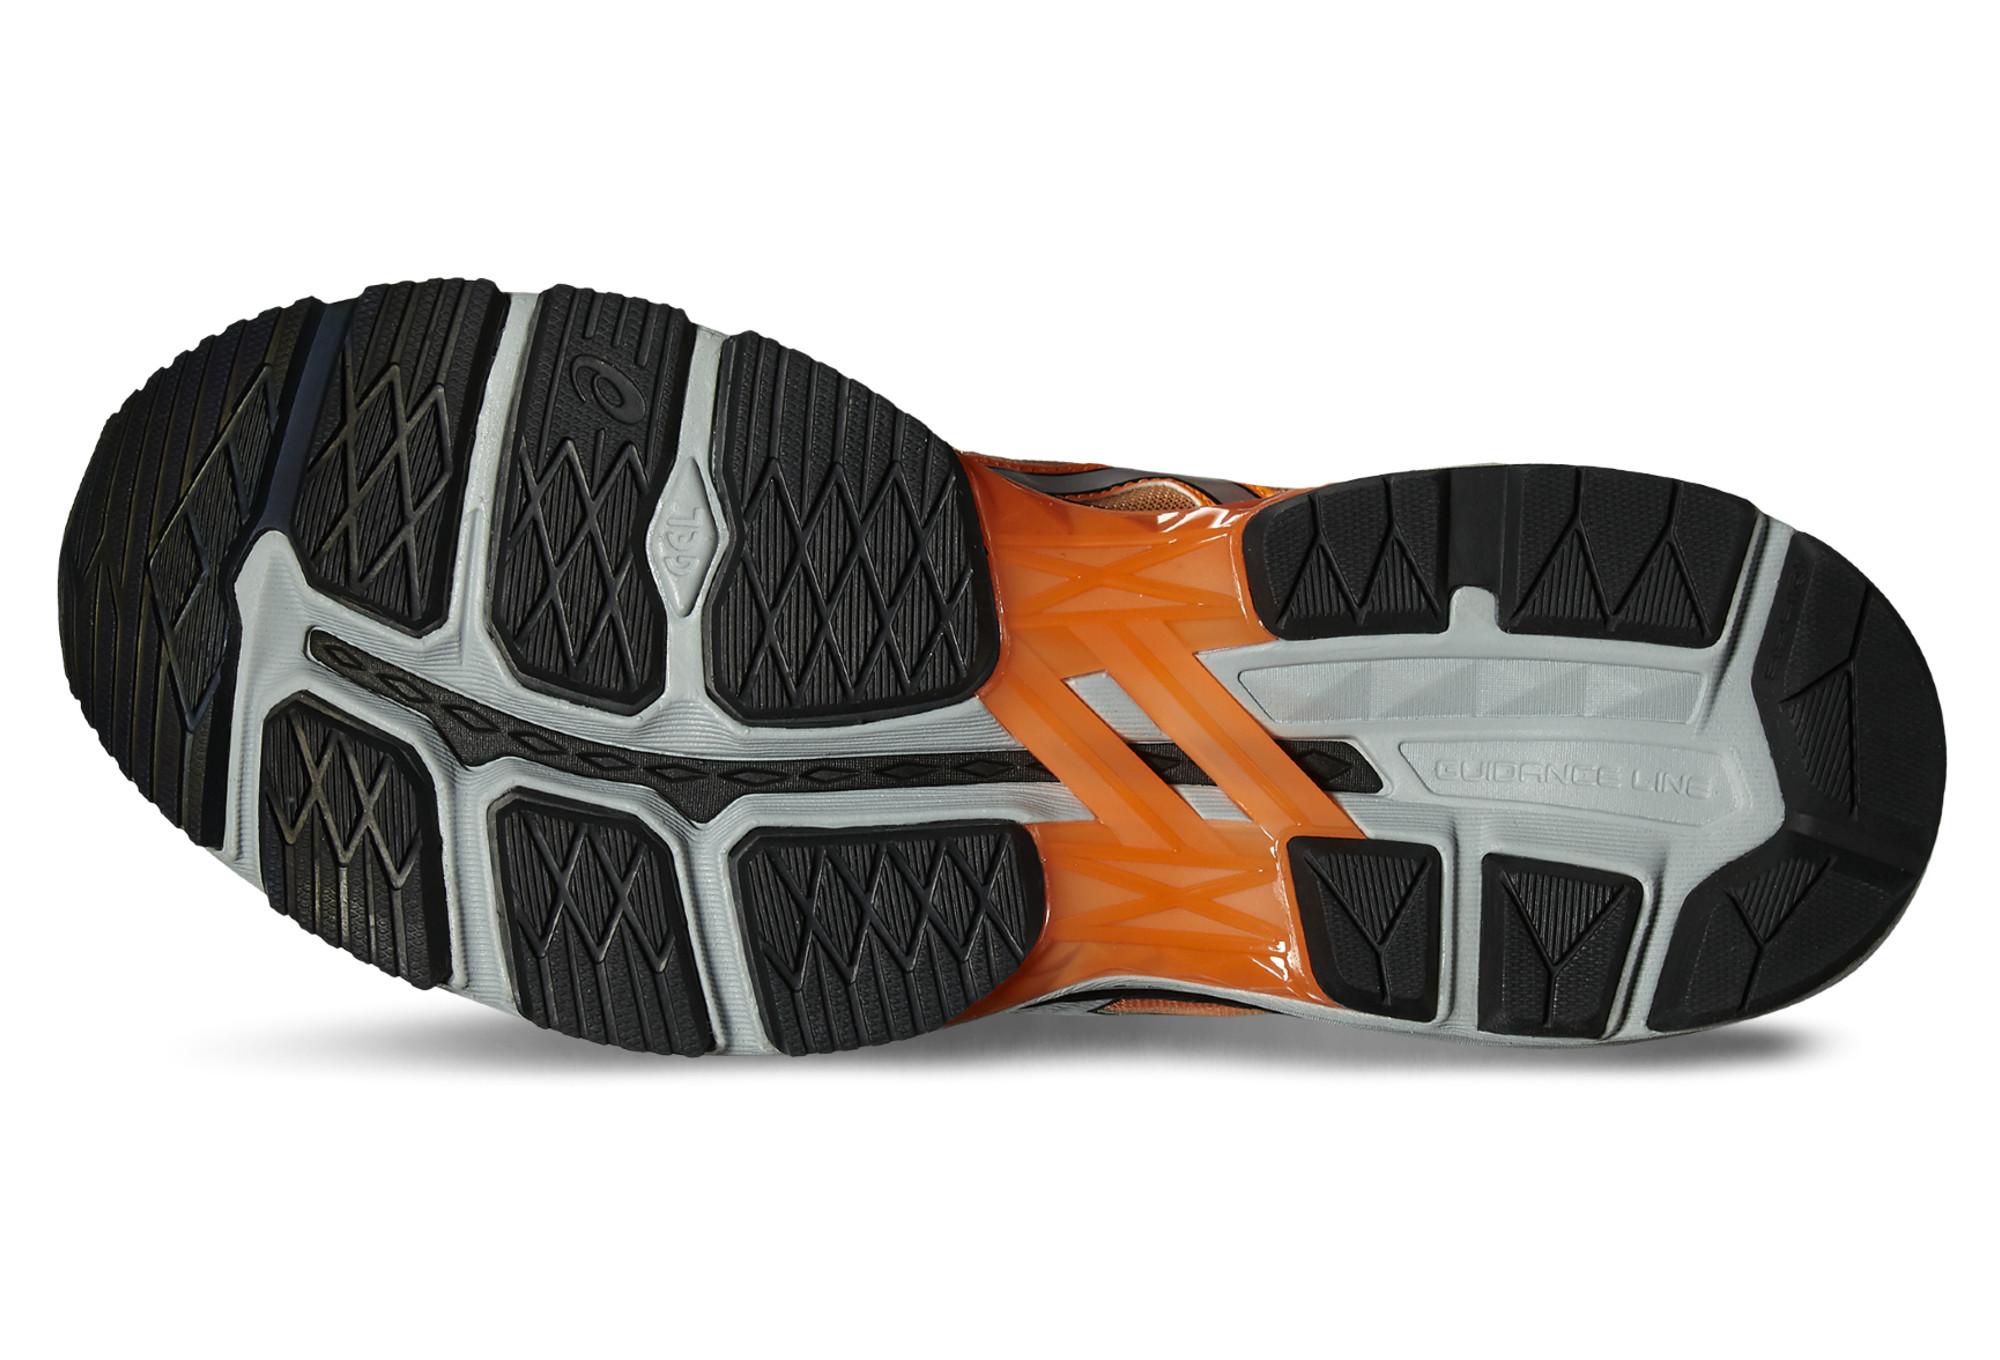 Plasmaguard De Argent Running 2000 Show Lite Asics 4 Chaussures Gt URwqwv